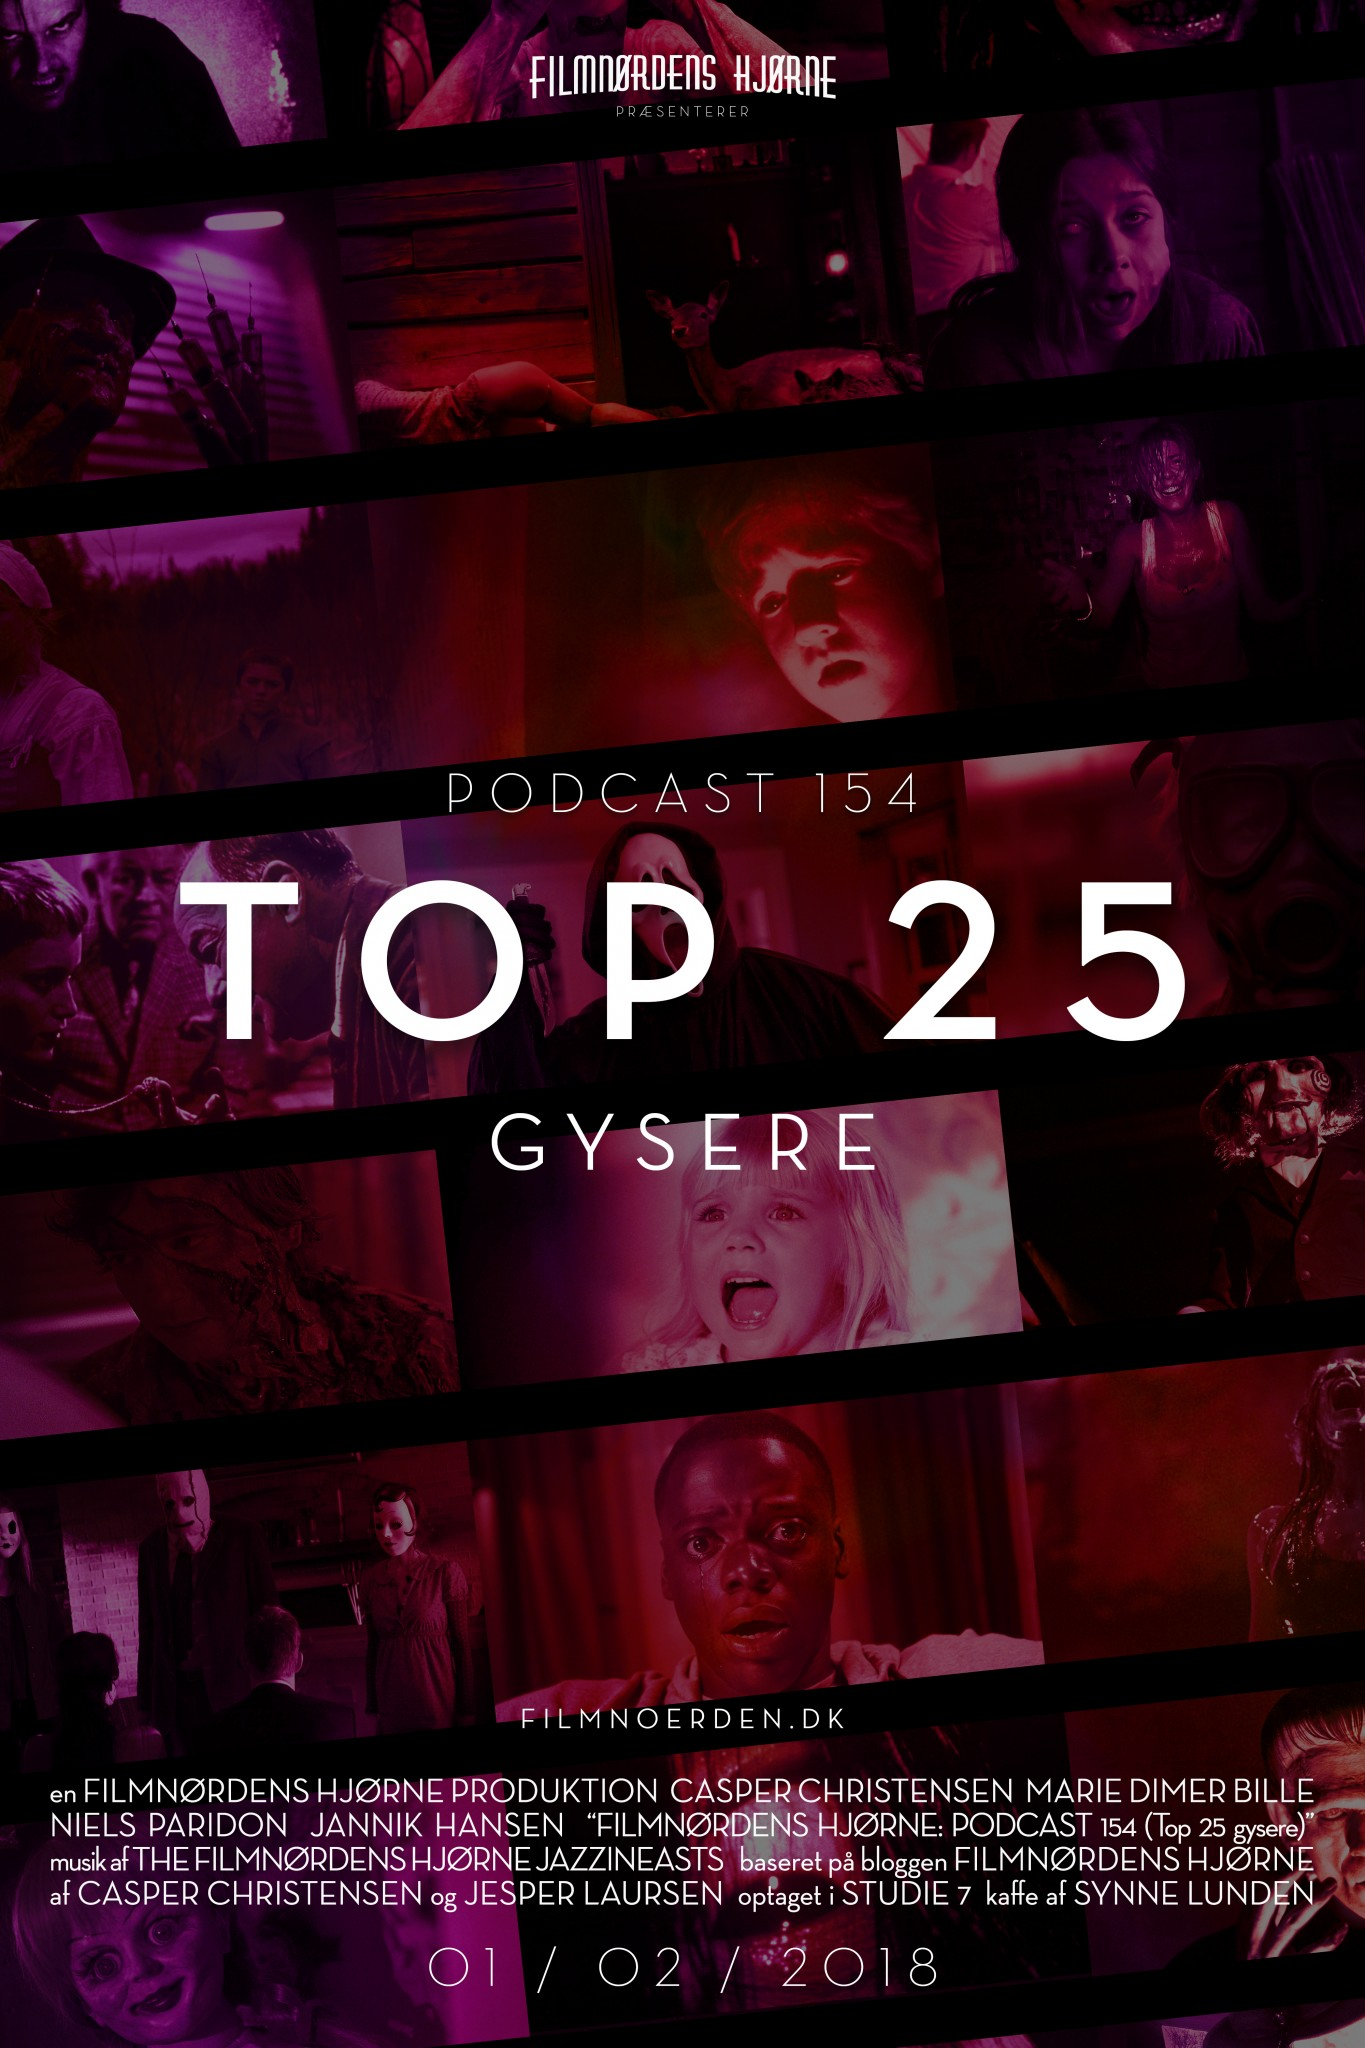 Podcast 154